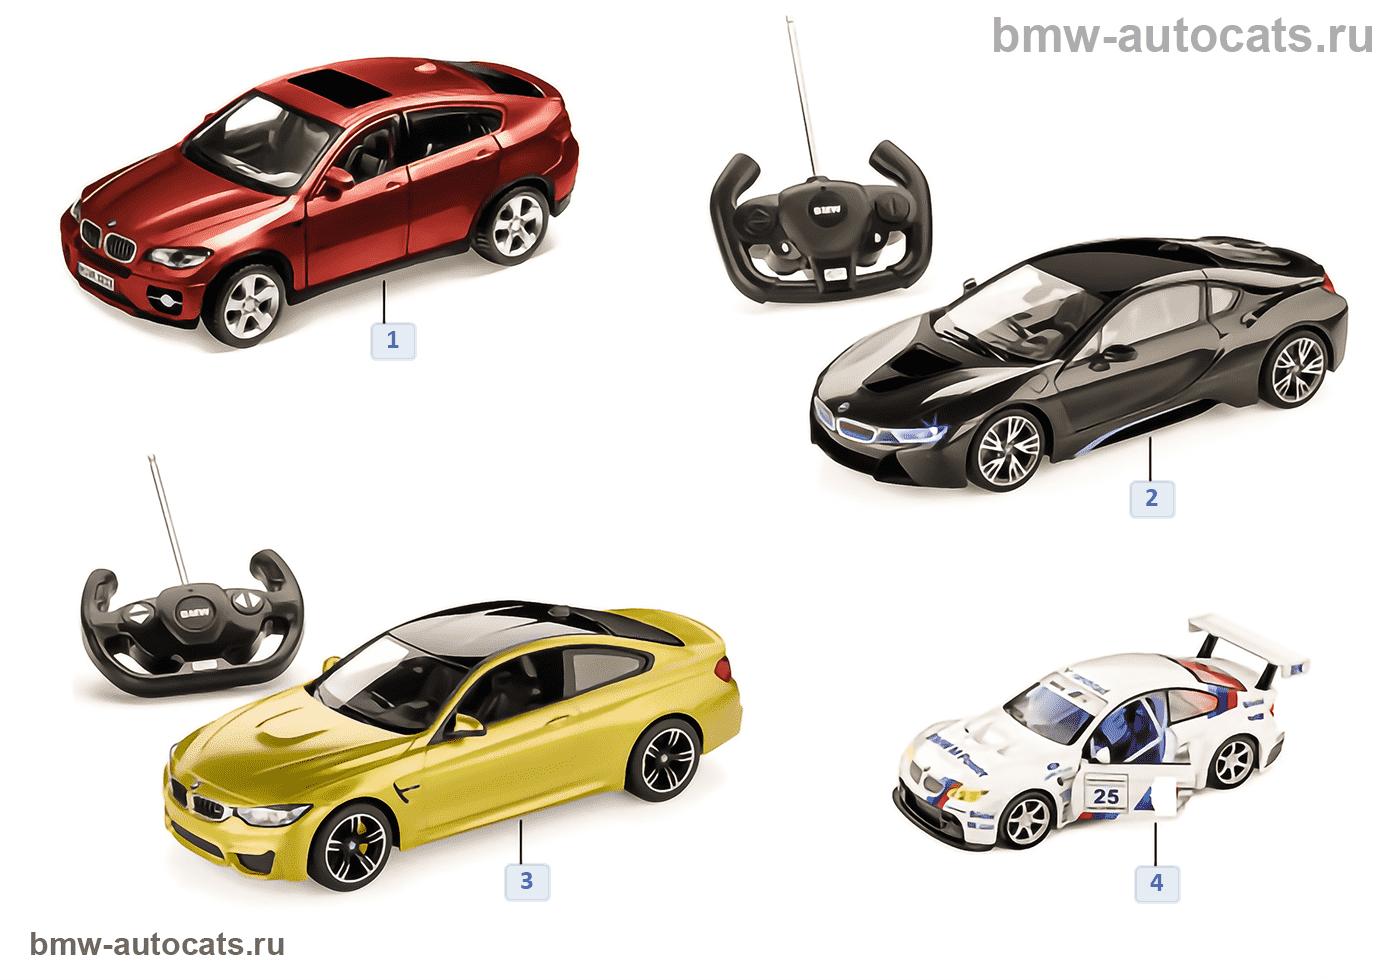 BMW дети — мин.мод.- Fun Cars 16-18